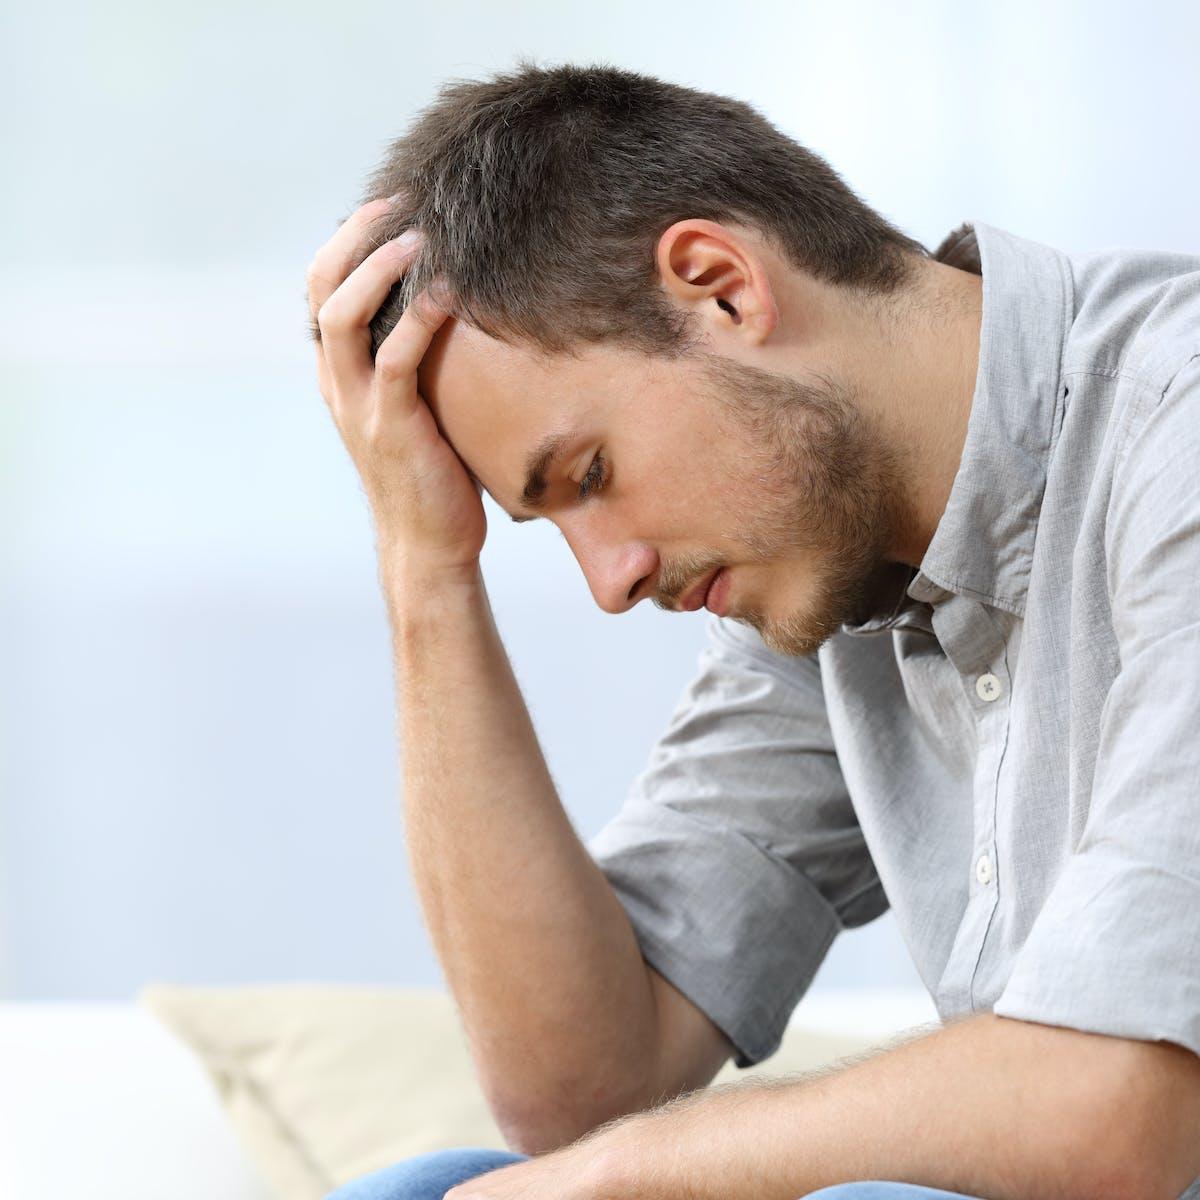 Male midlife crisis divorce